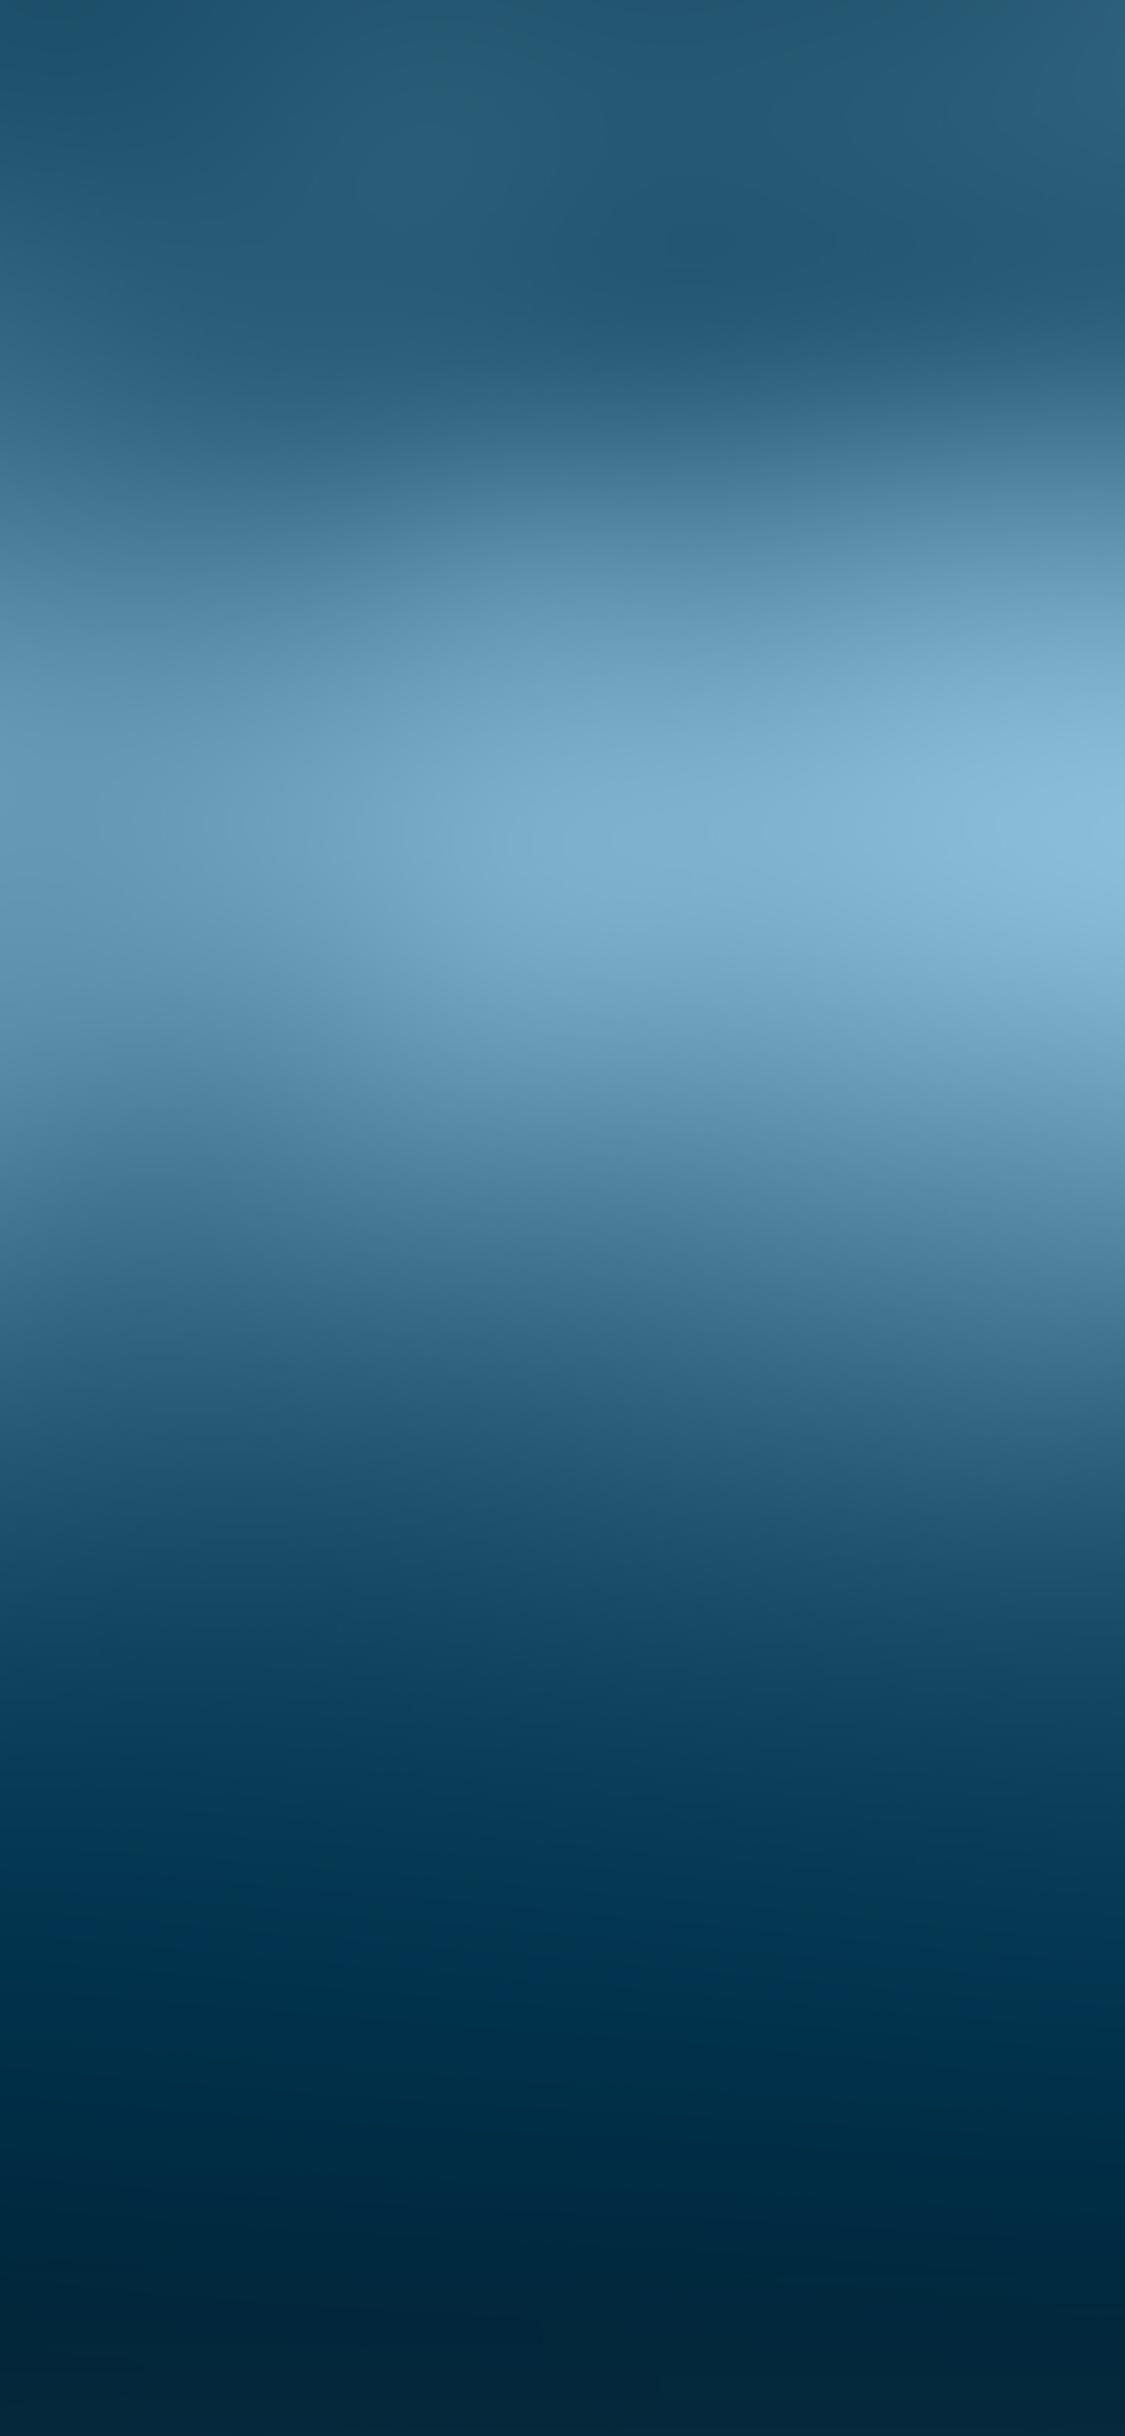 iPhoneXpapers.com-Apple-iPhone-wallpaper-sc76-coast-to-coast-blur